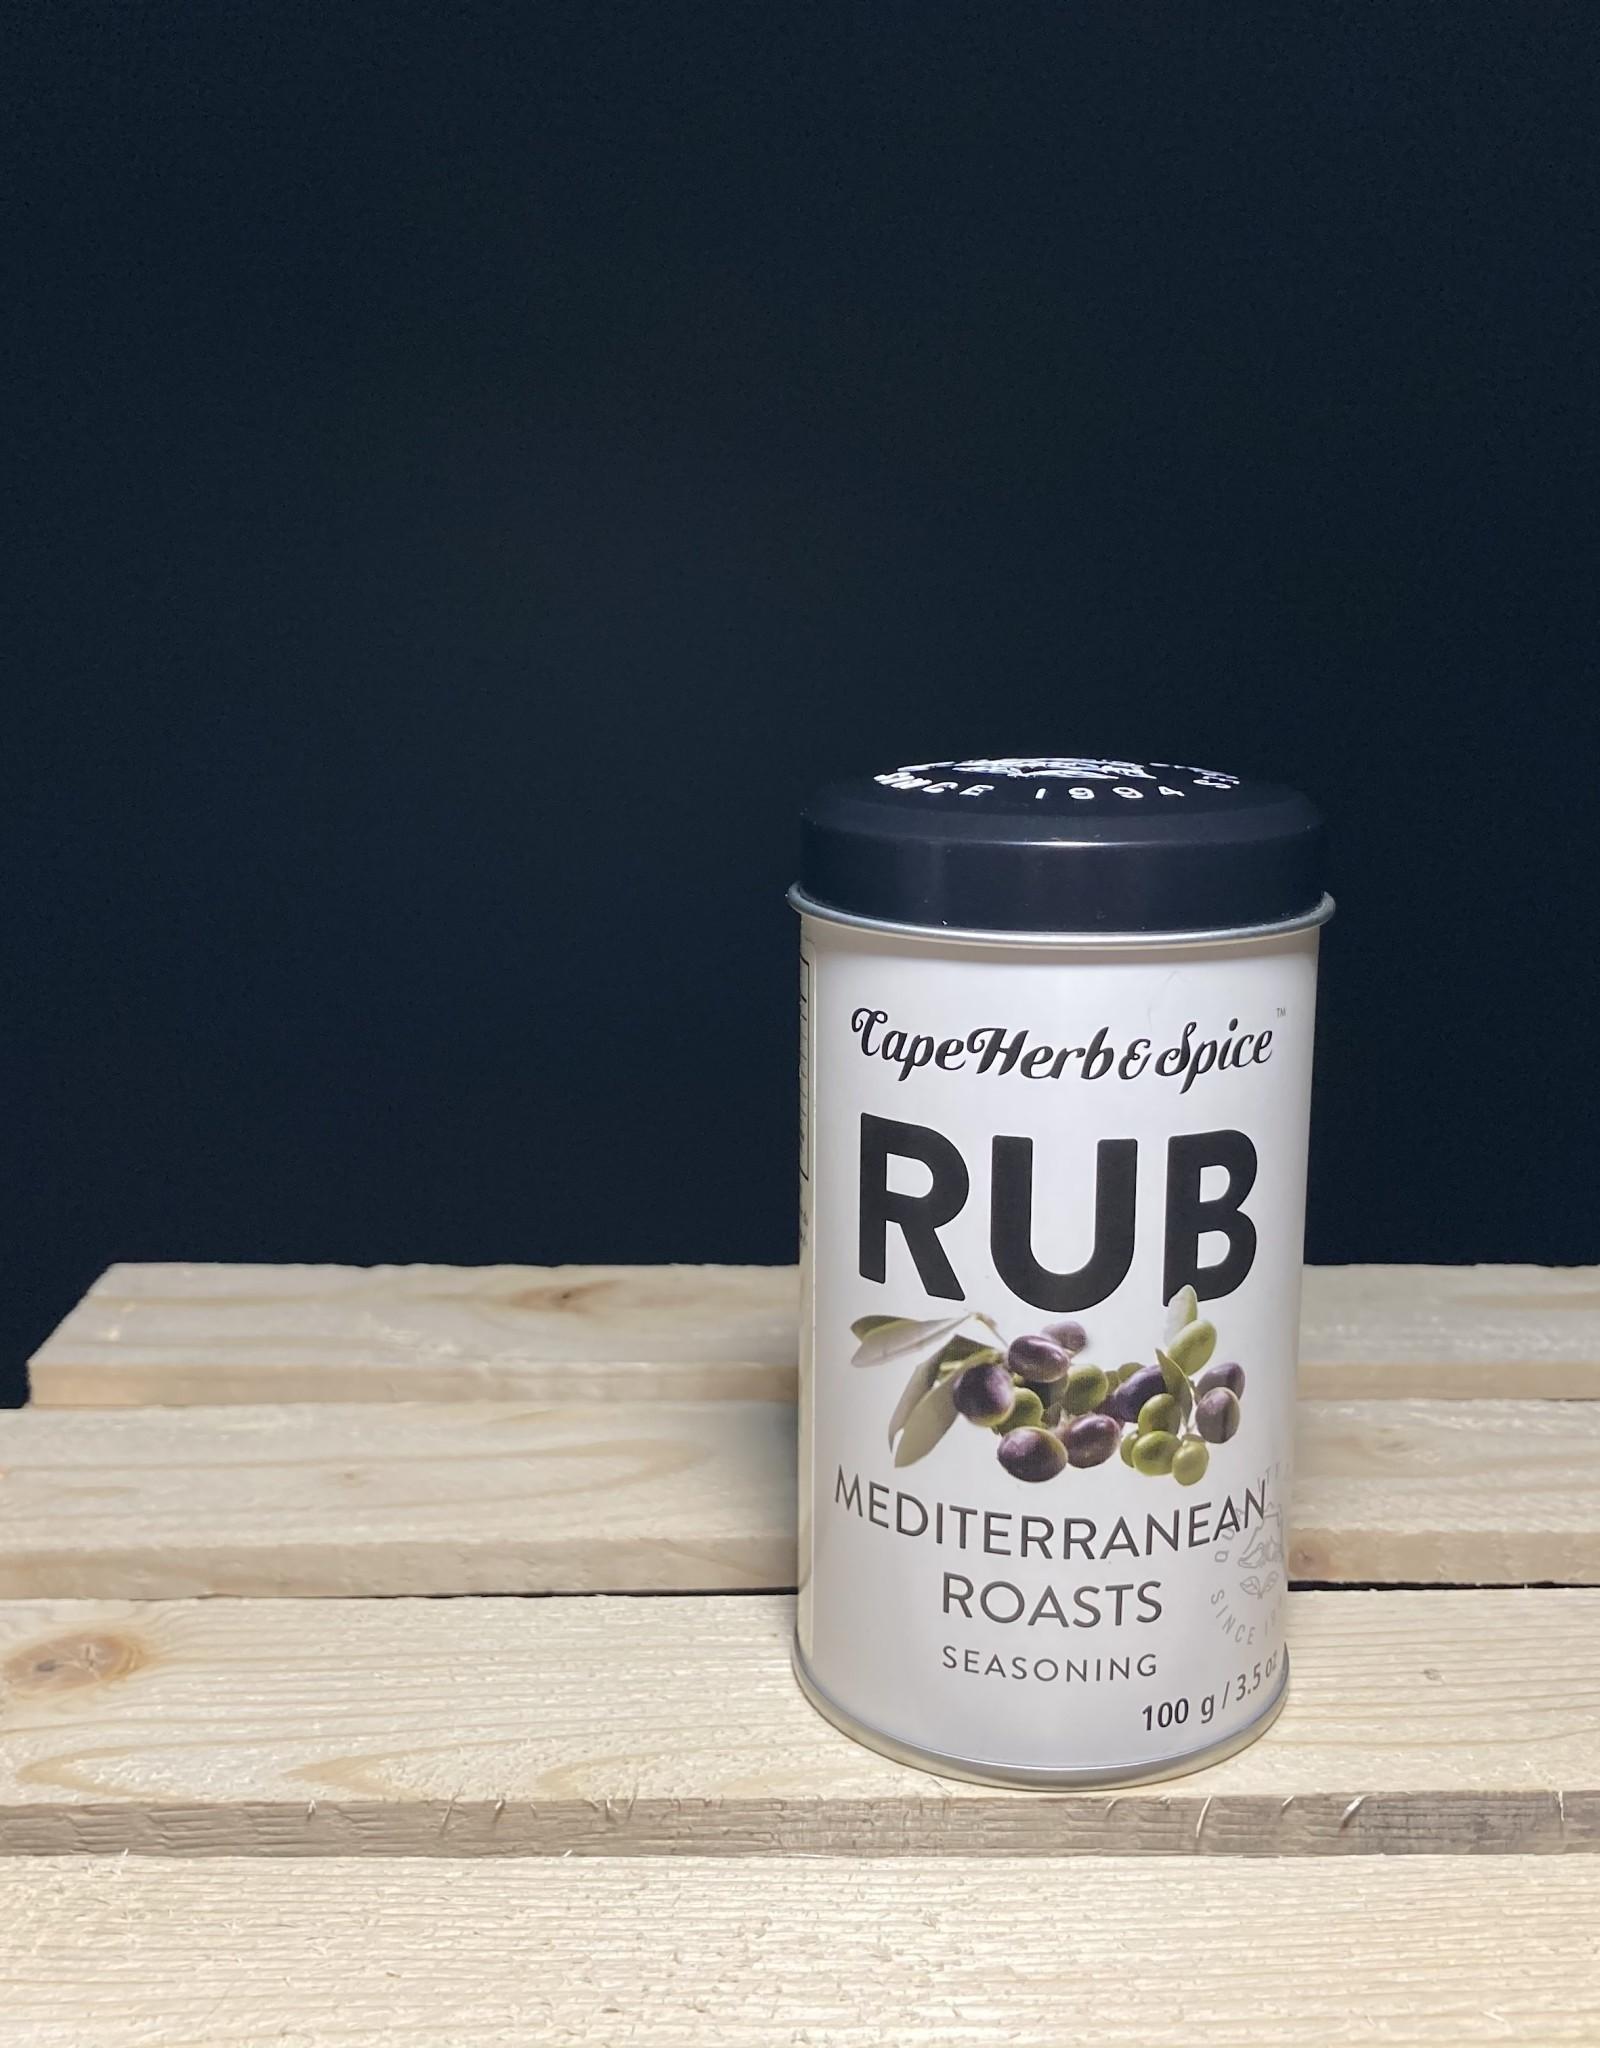 Cape Herb & Spice Co. Cape Herb & Spice - Rub Shaker, Mediterranean Roasts (100g)